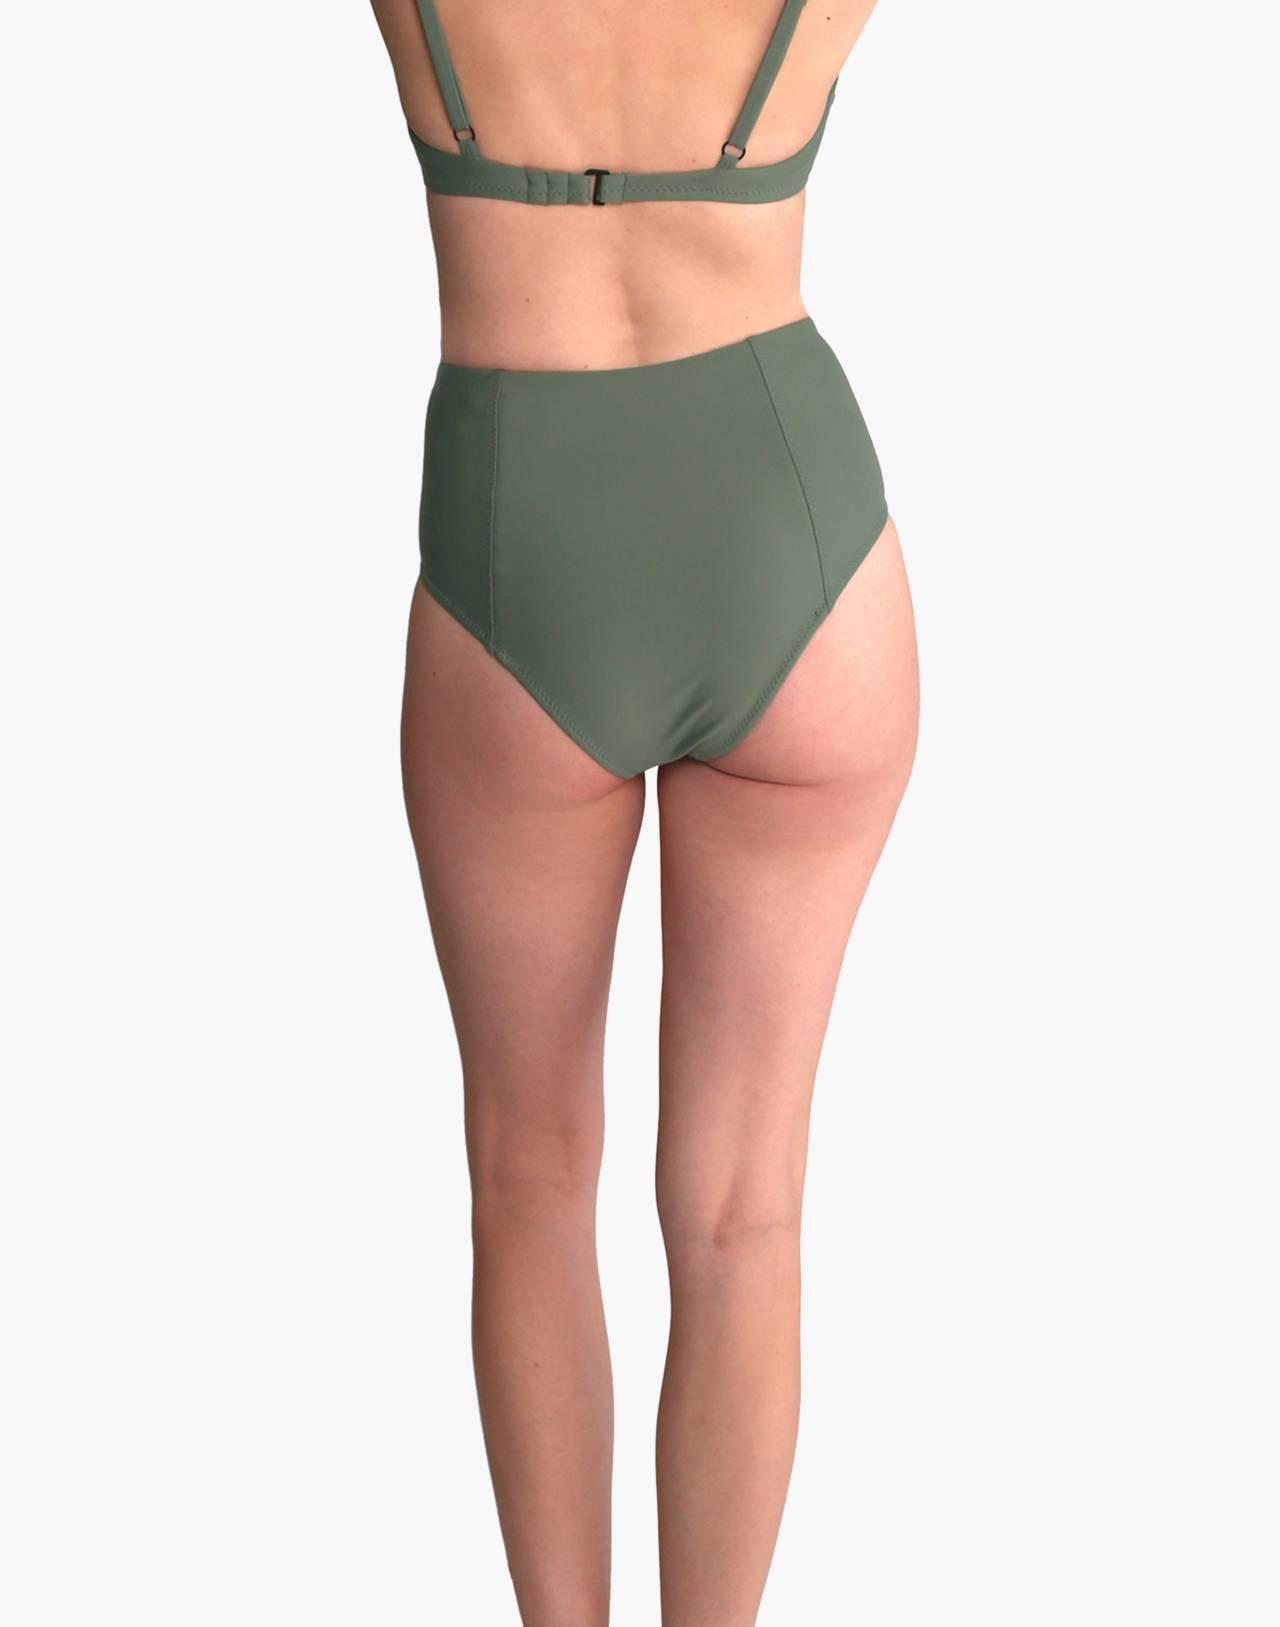 GALAMAAR® High Bikini Bottom in green image 3